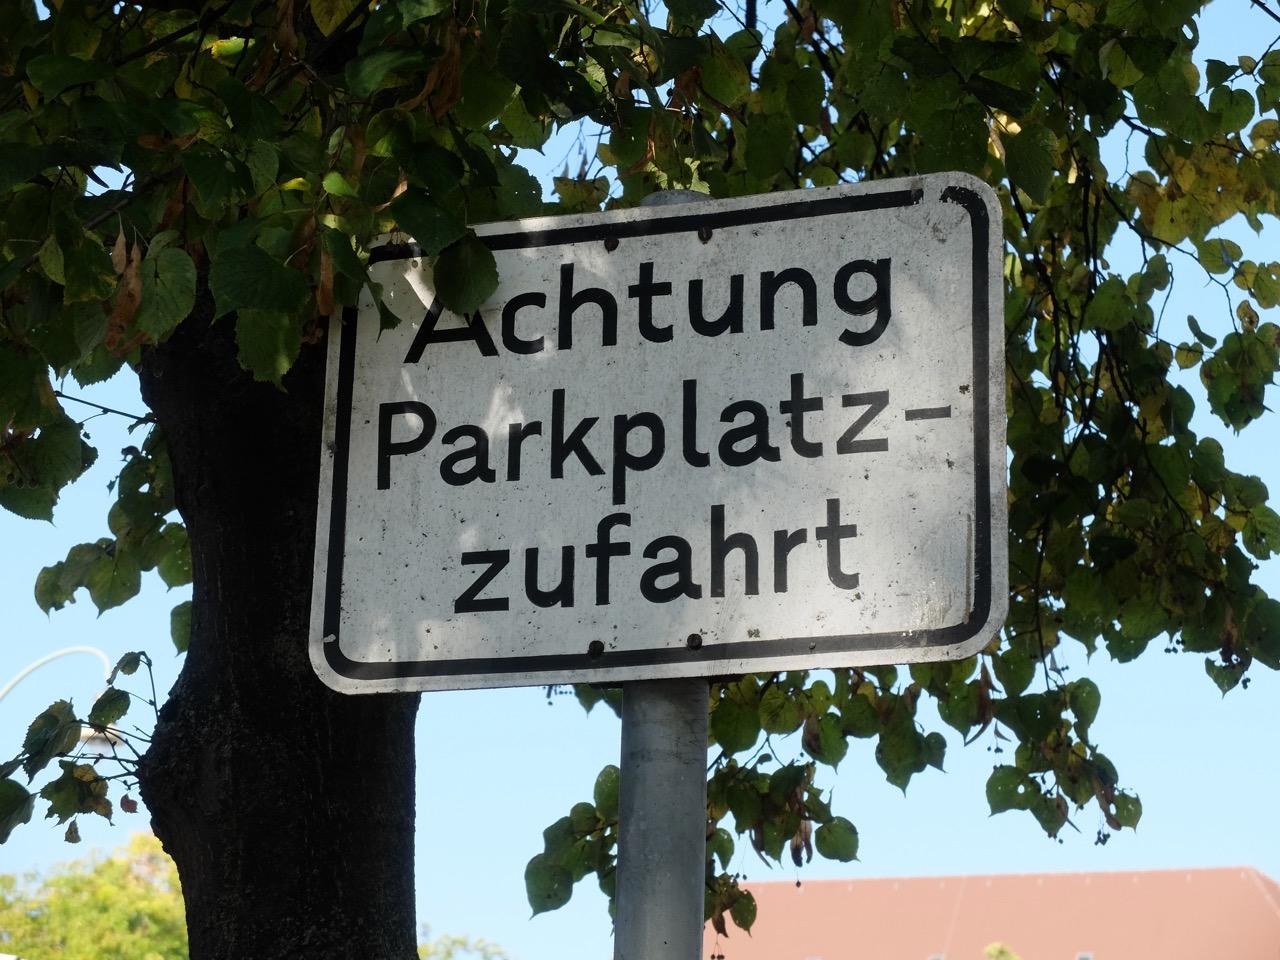 Achtung Parkplatz-Zufahrt | Radfahrerzone.de